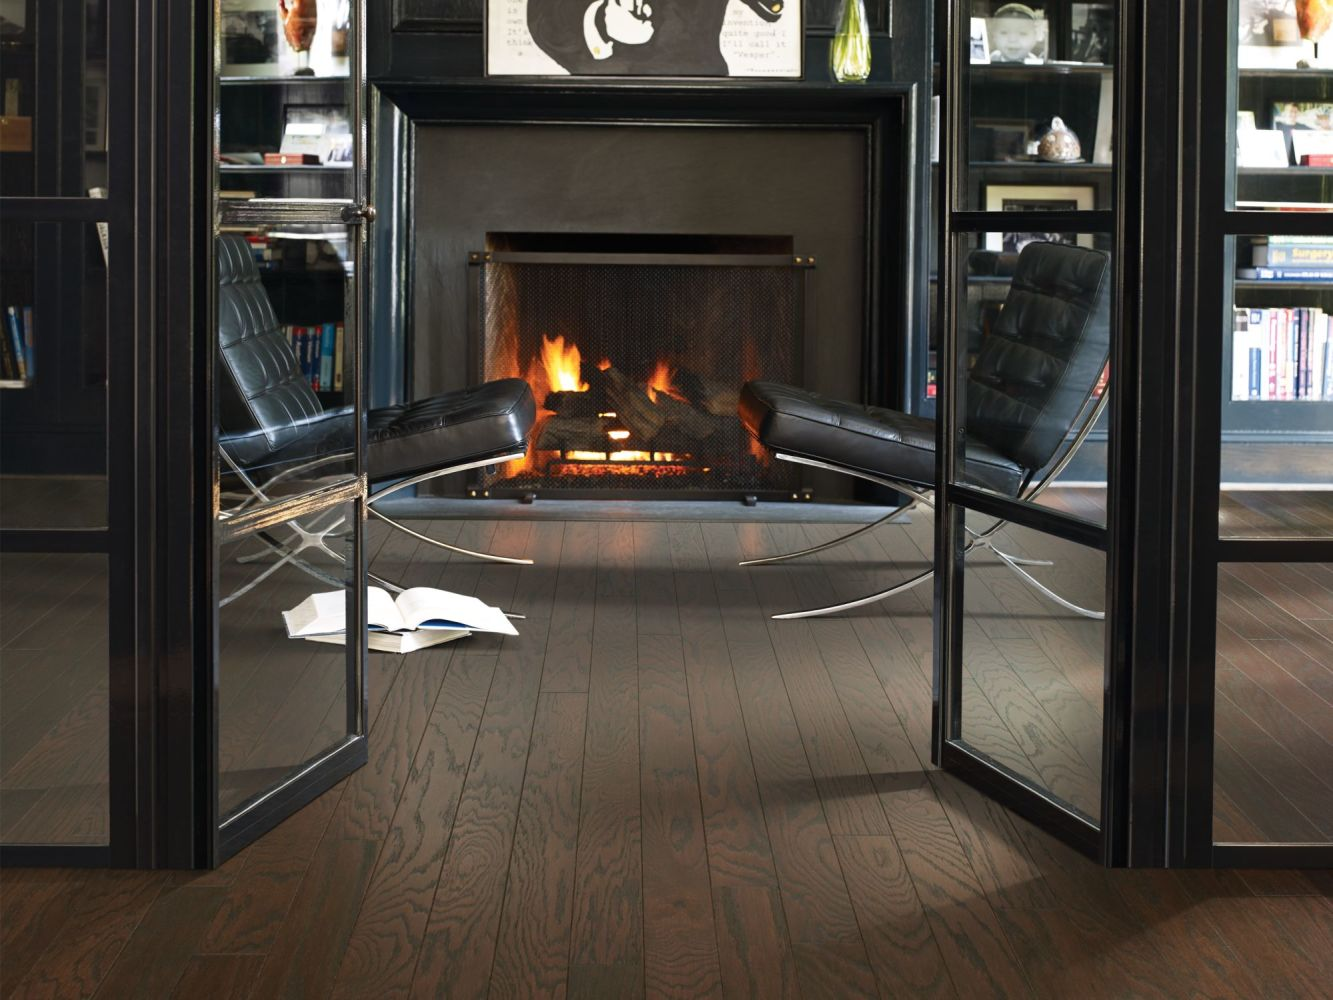 Shaw Floors Ashton Woods Homes Timeless 3.25″ Coffee Bean 00938_A020S